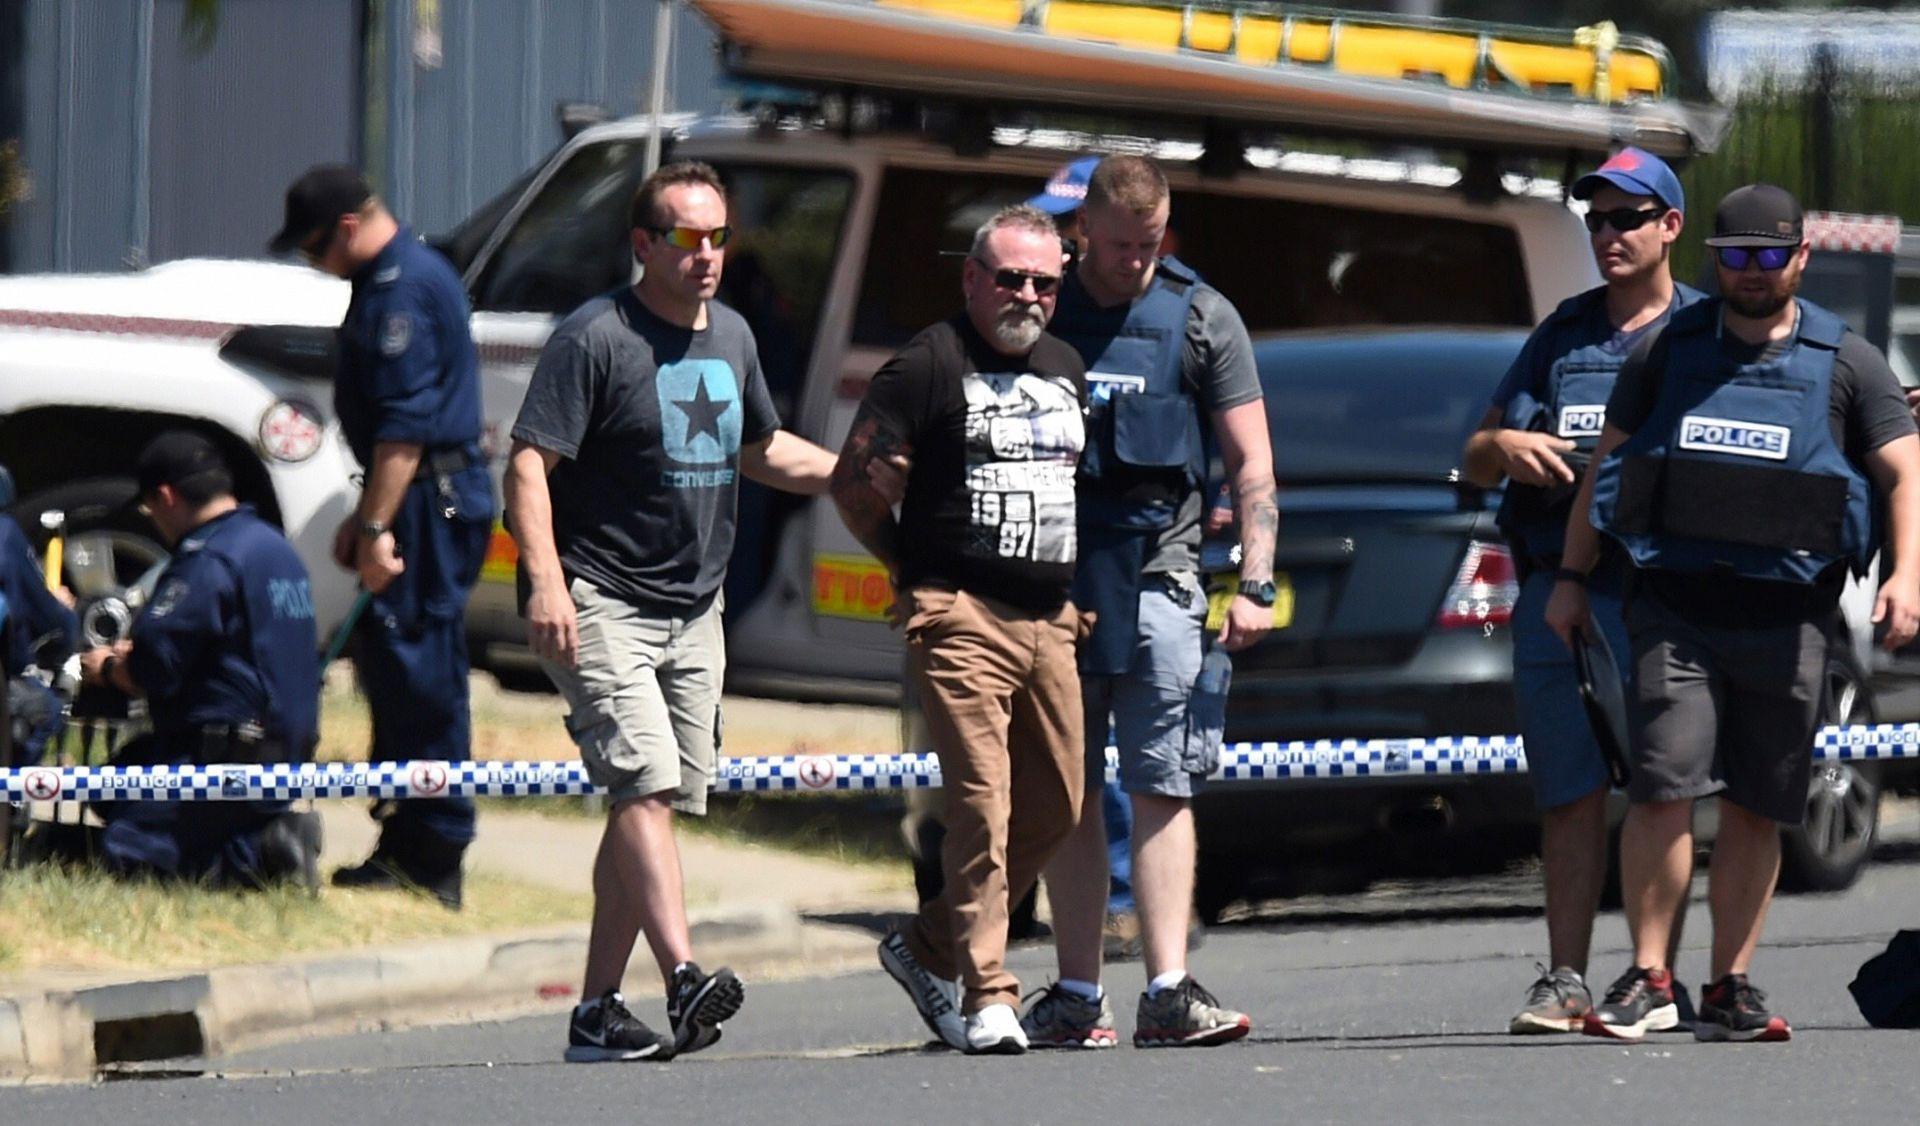 Sydney: Naoružani napadač ubio jednu osobu